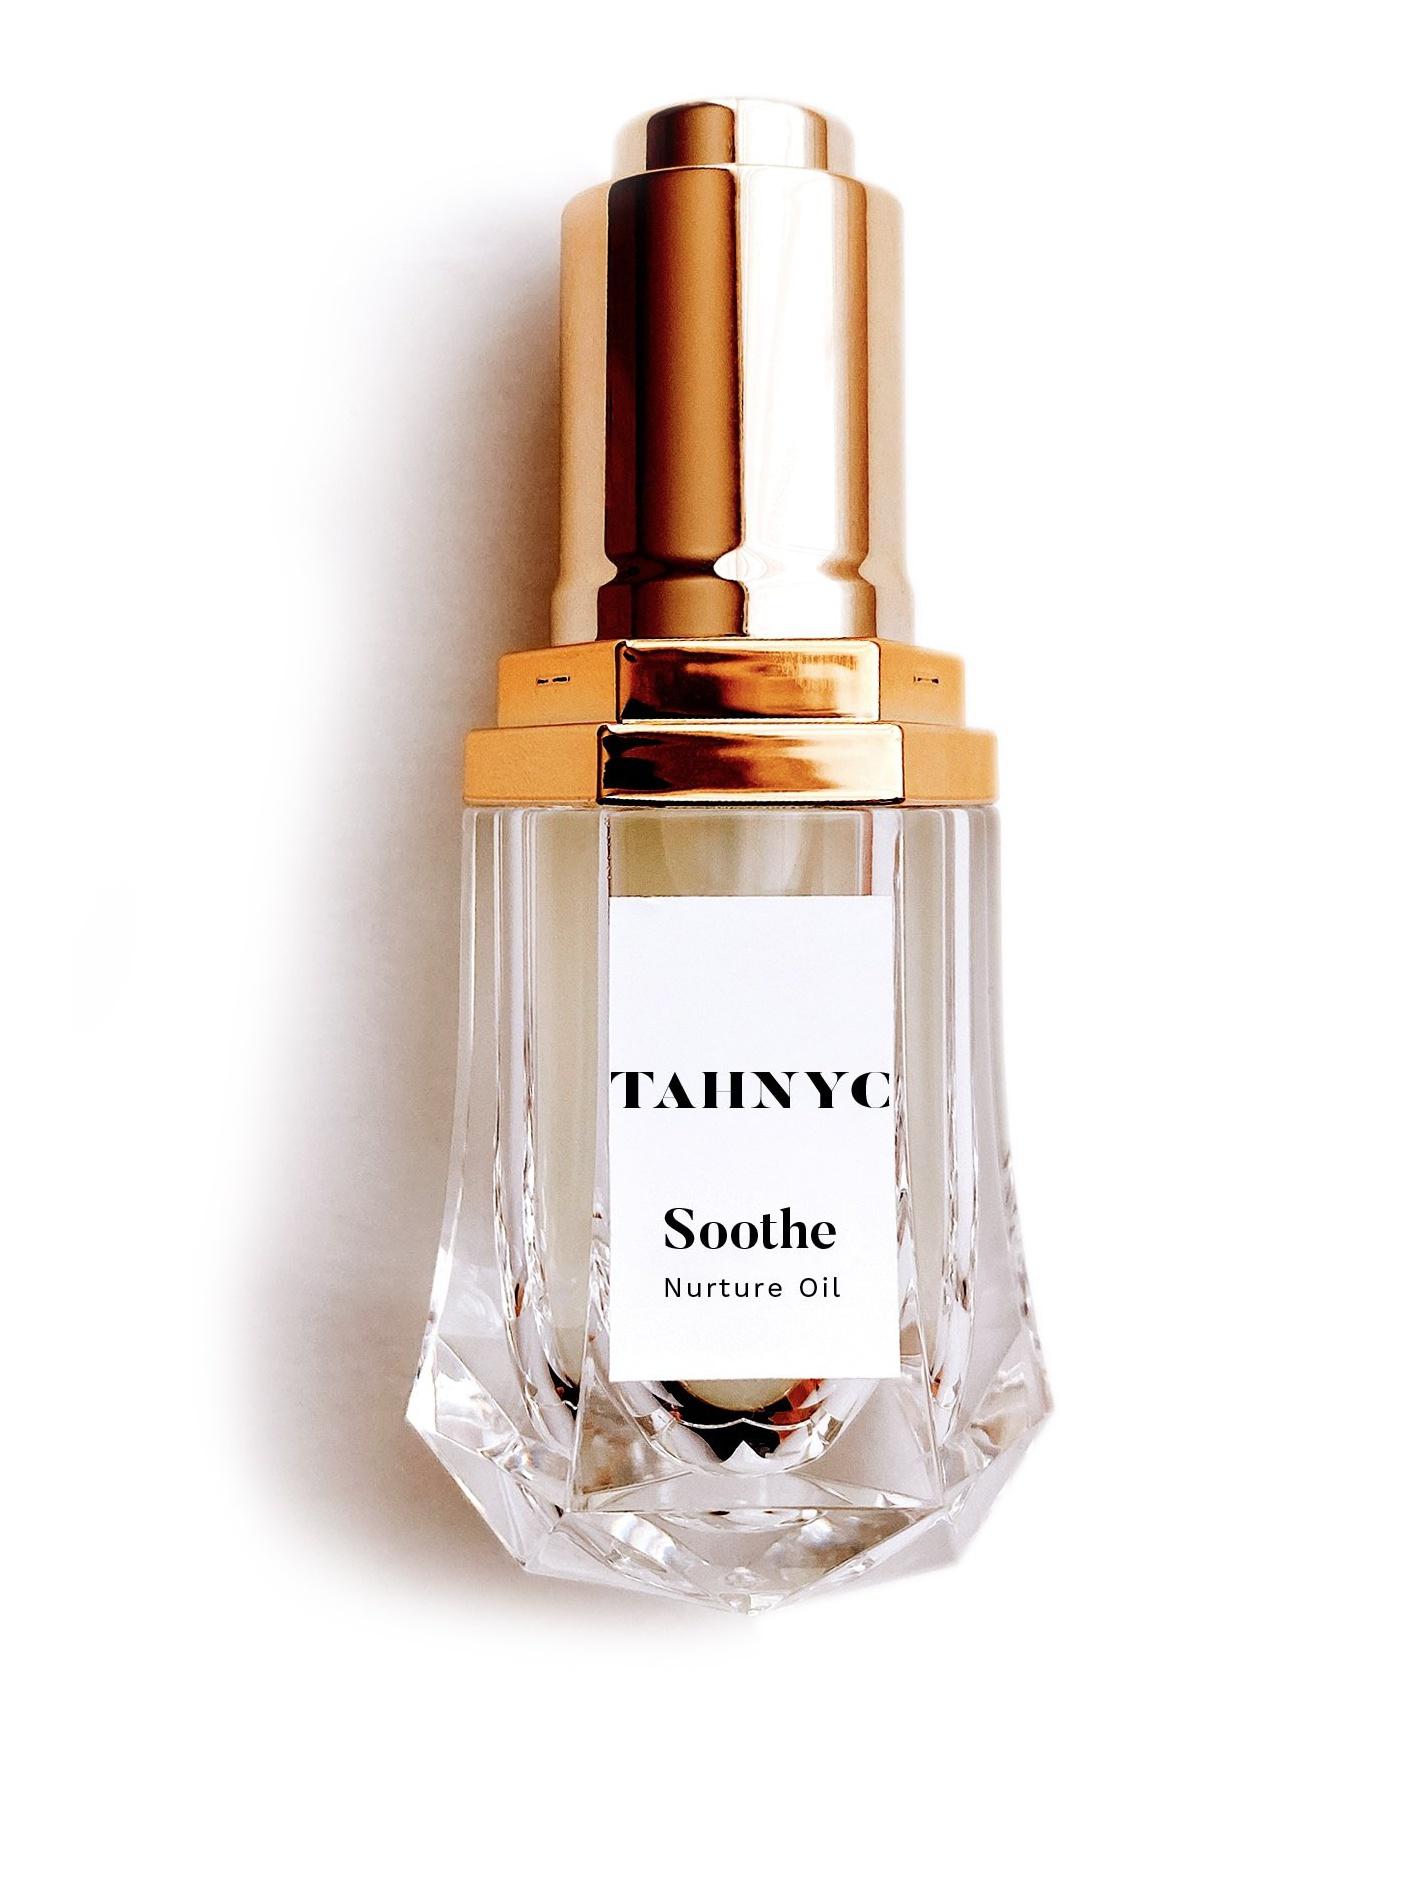 TAHNYC Soothe Nurture Oil